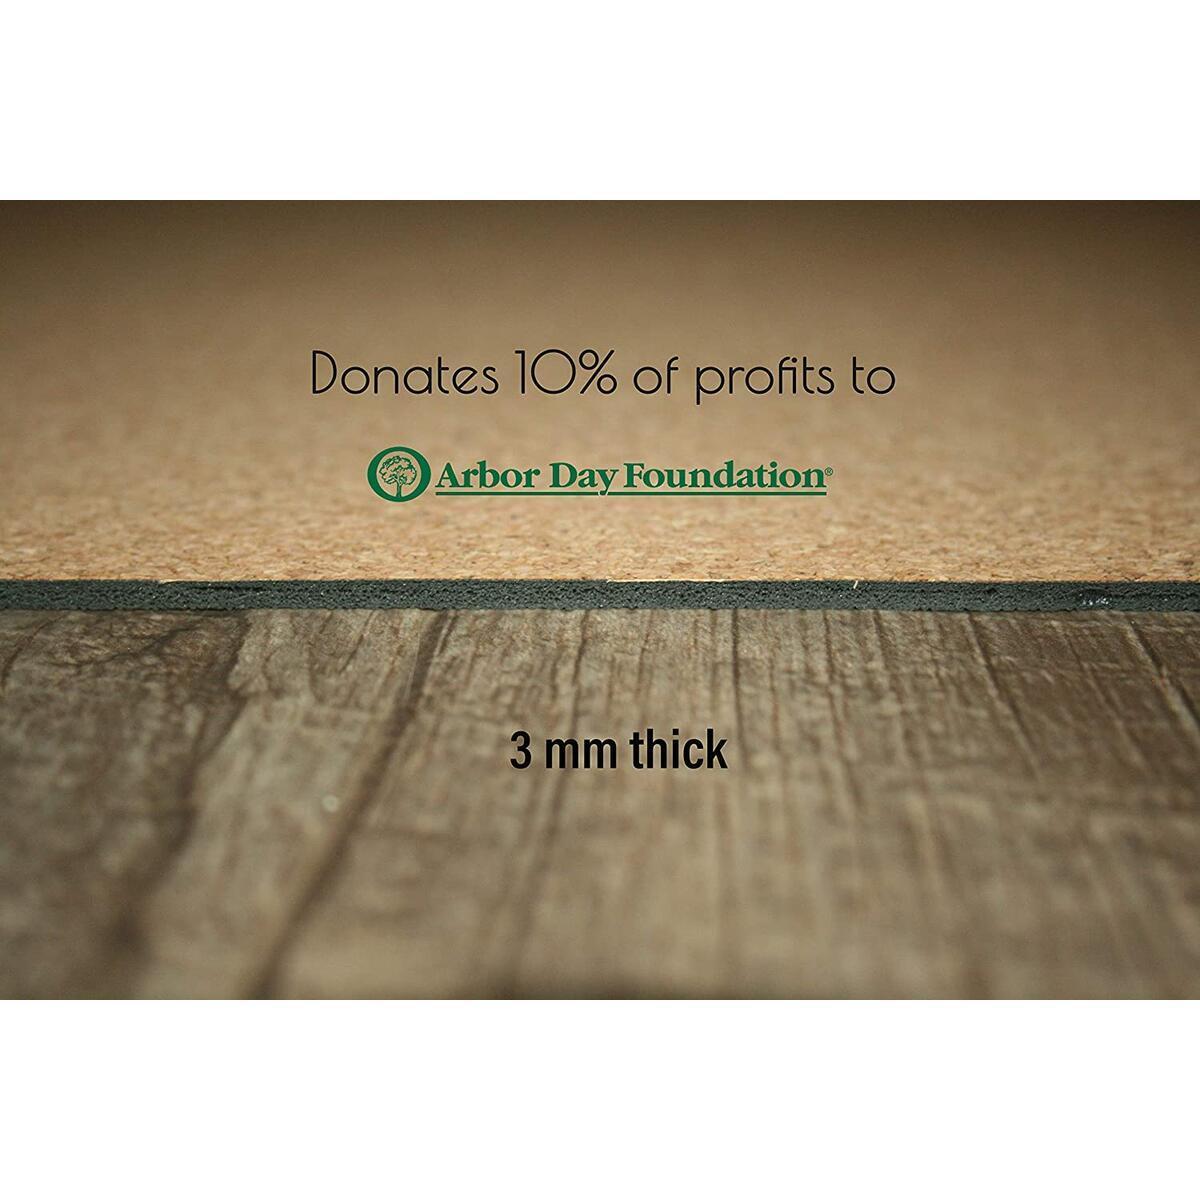 Cork and Natural Rubber Yoga Mat